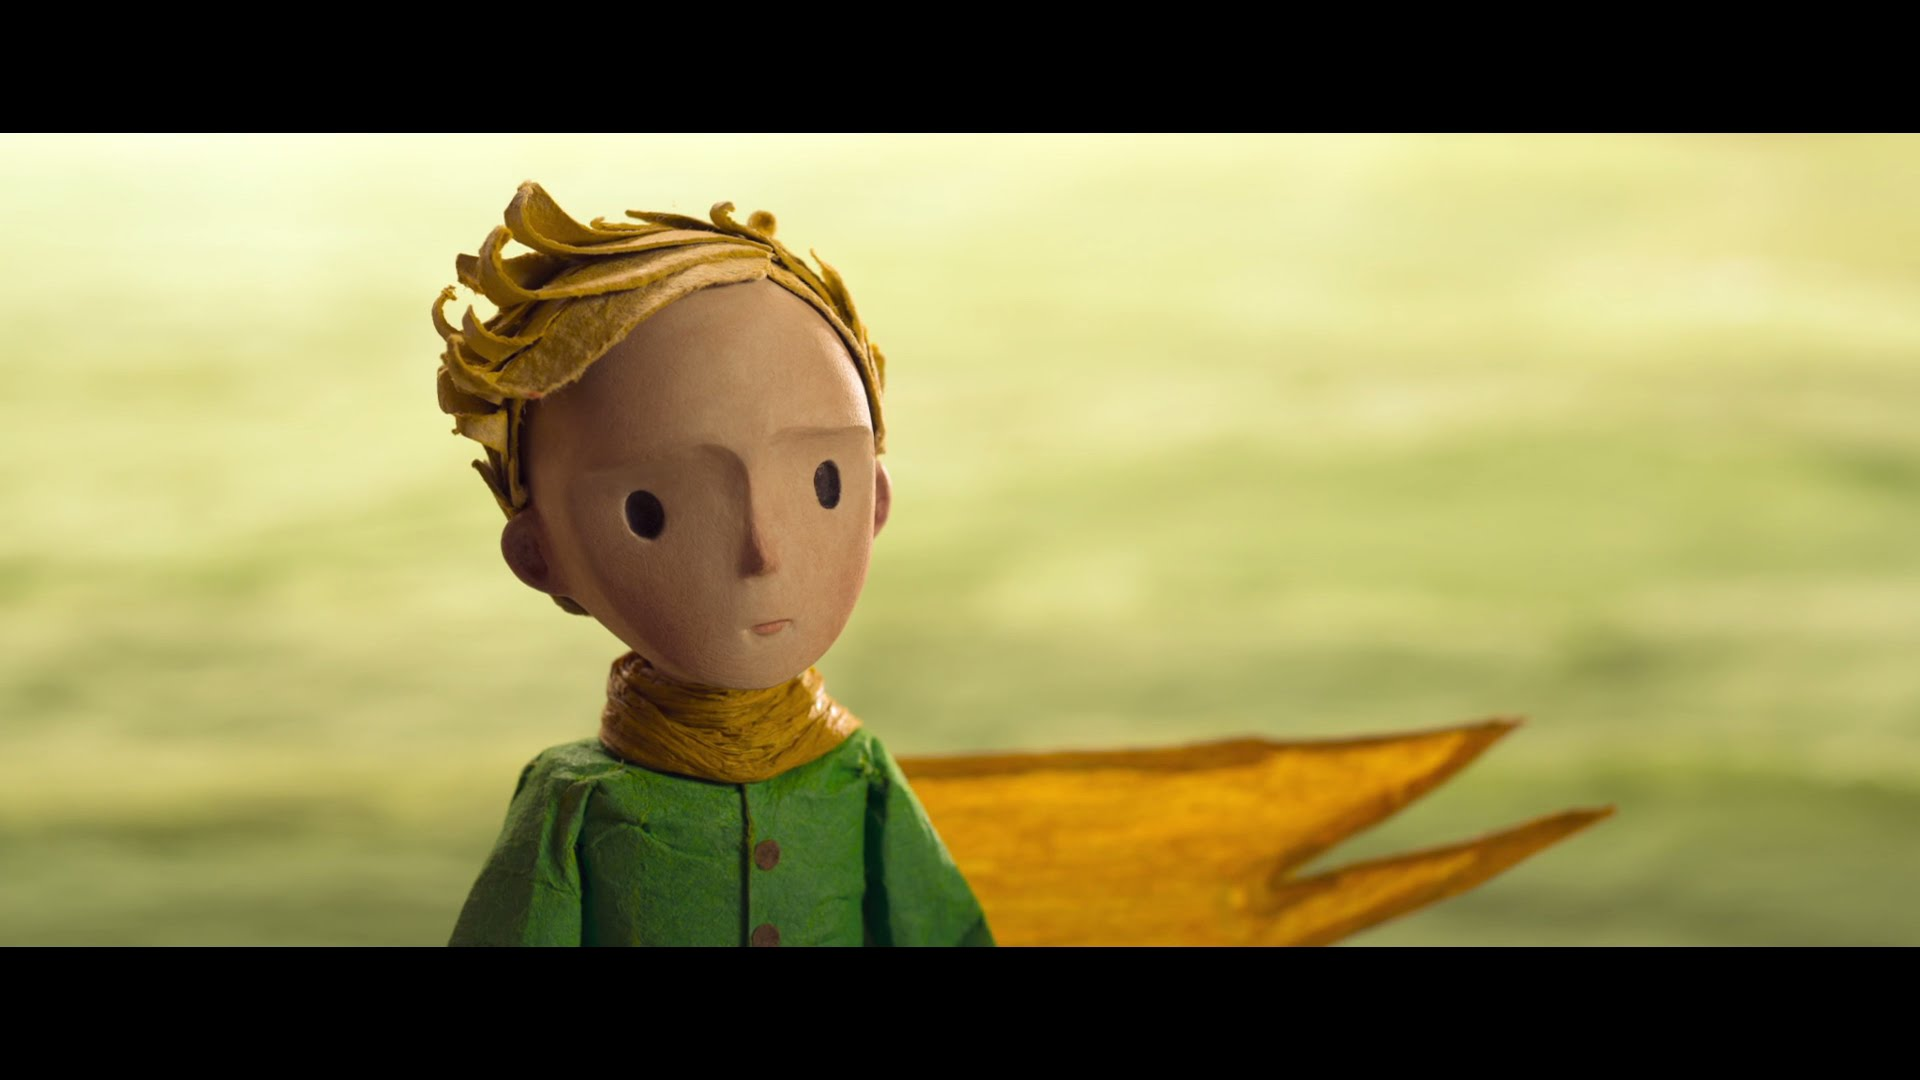 「找回心中的小王子」- THE LITTLE PRINCE - Official International Trailer